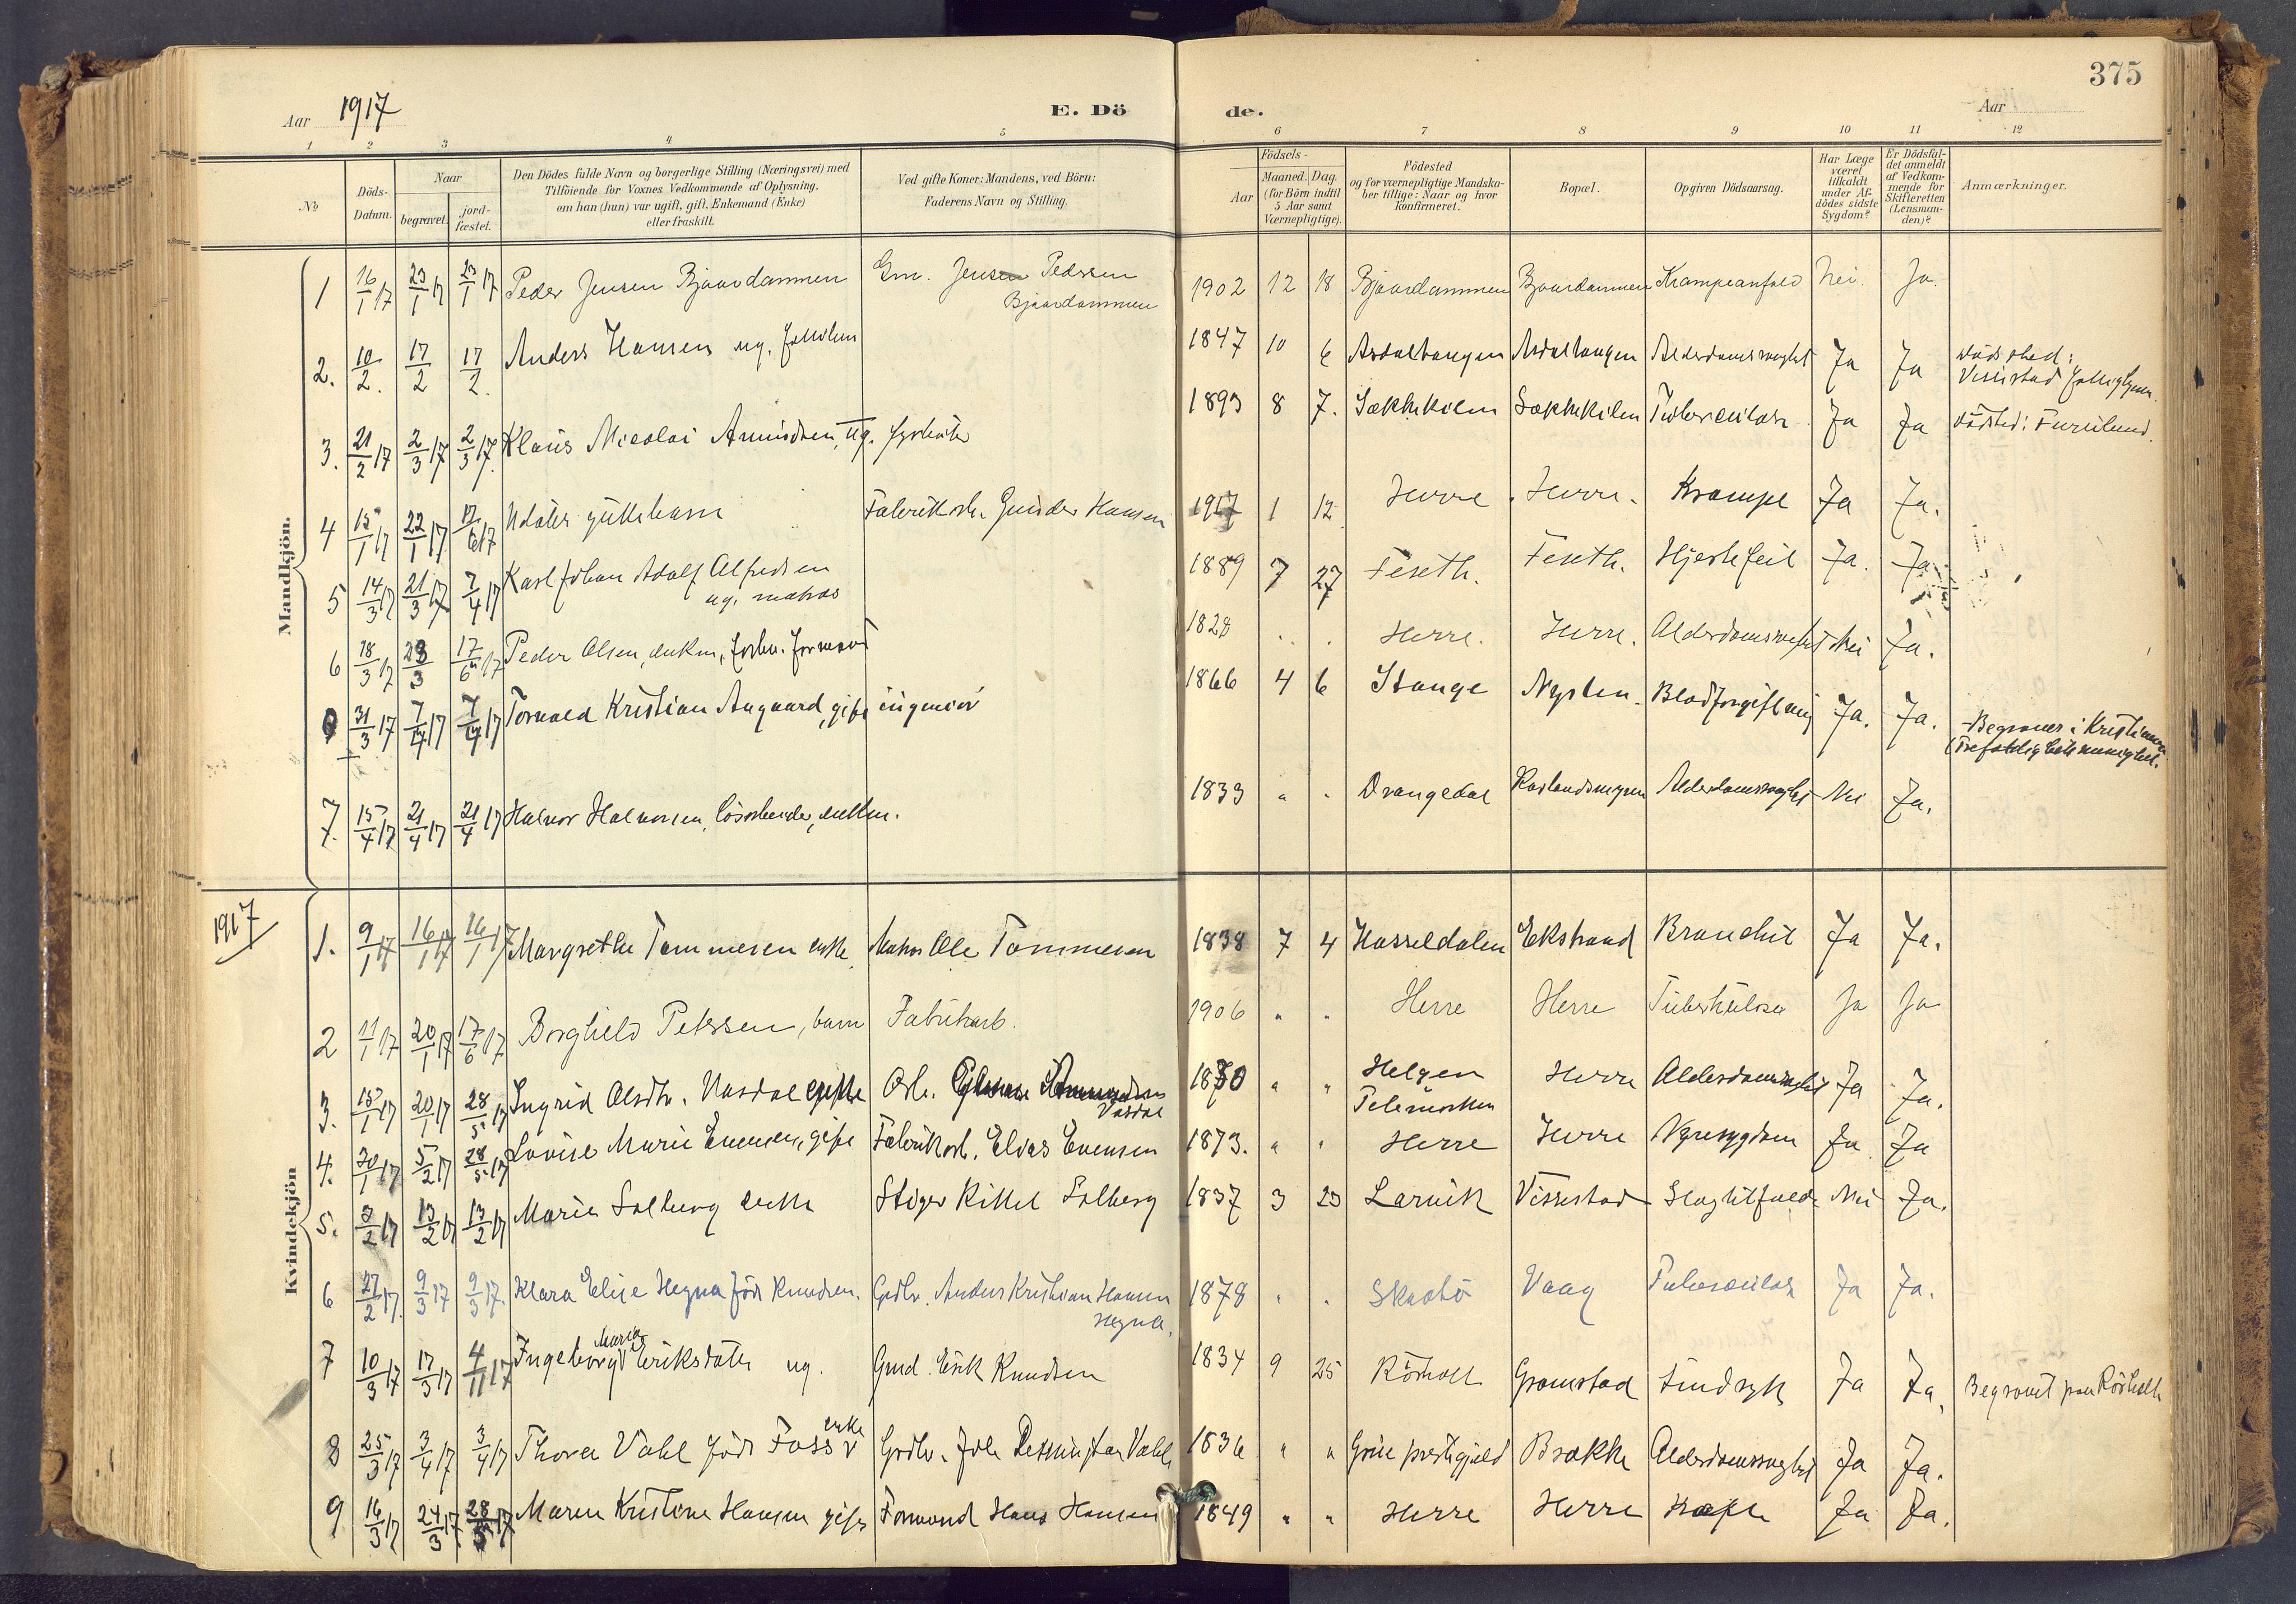 SAKO, Bamble kirkebøker, F/Fa/L0009: Ministerialbok nr. I 9, 1901-1917, s. 375